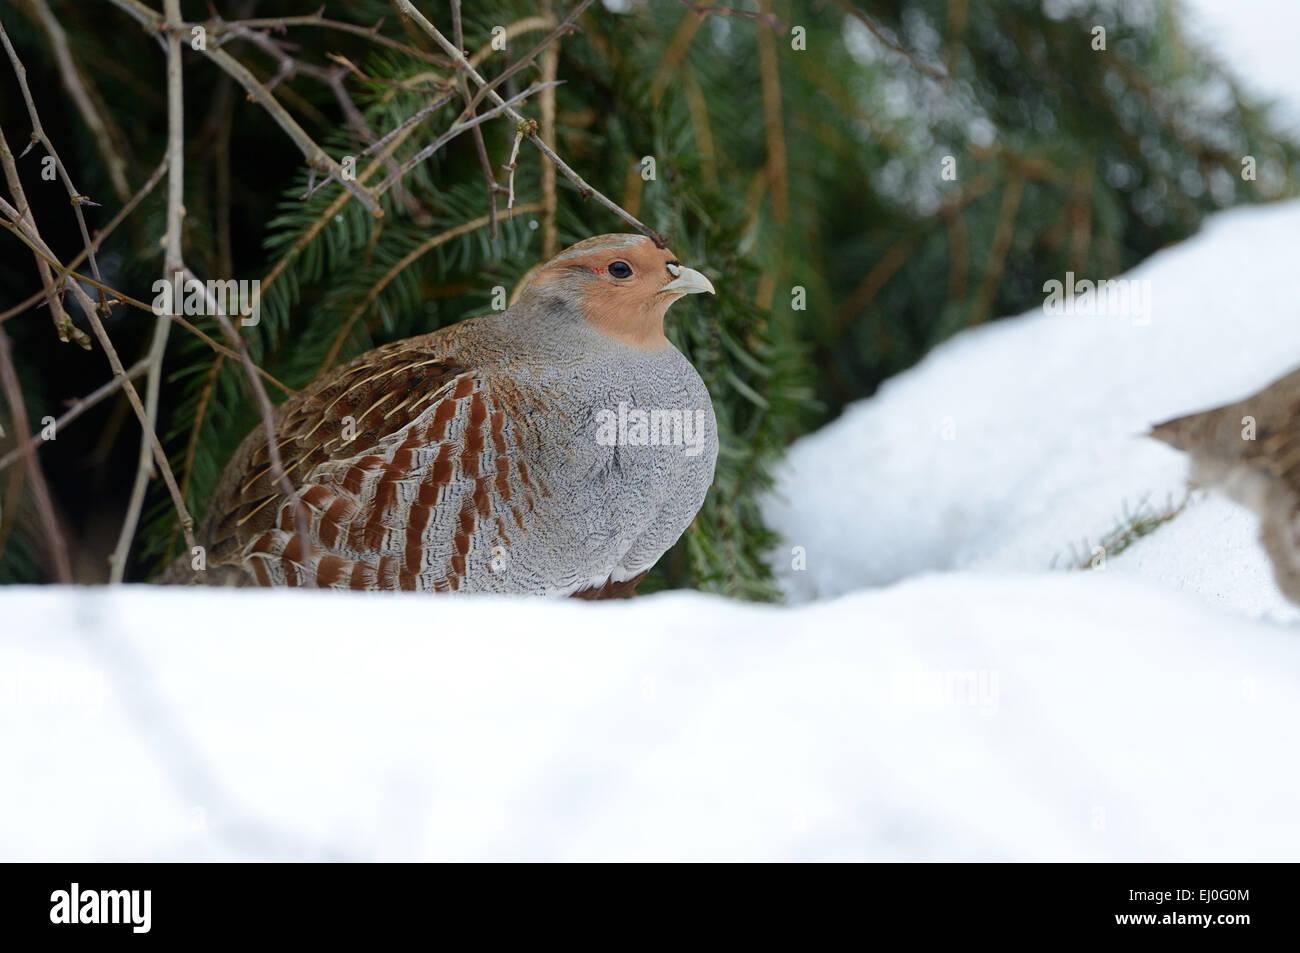 Partridge, Perdix perdix, chickens, hens, wild chickens, bird, Galliformes, partridges, bird, birds, winter, snow, - Stock Image